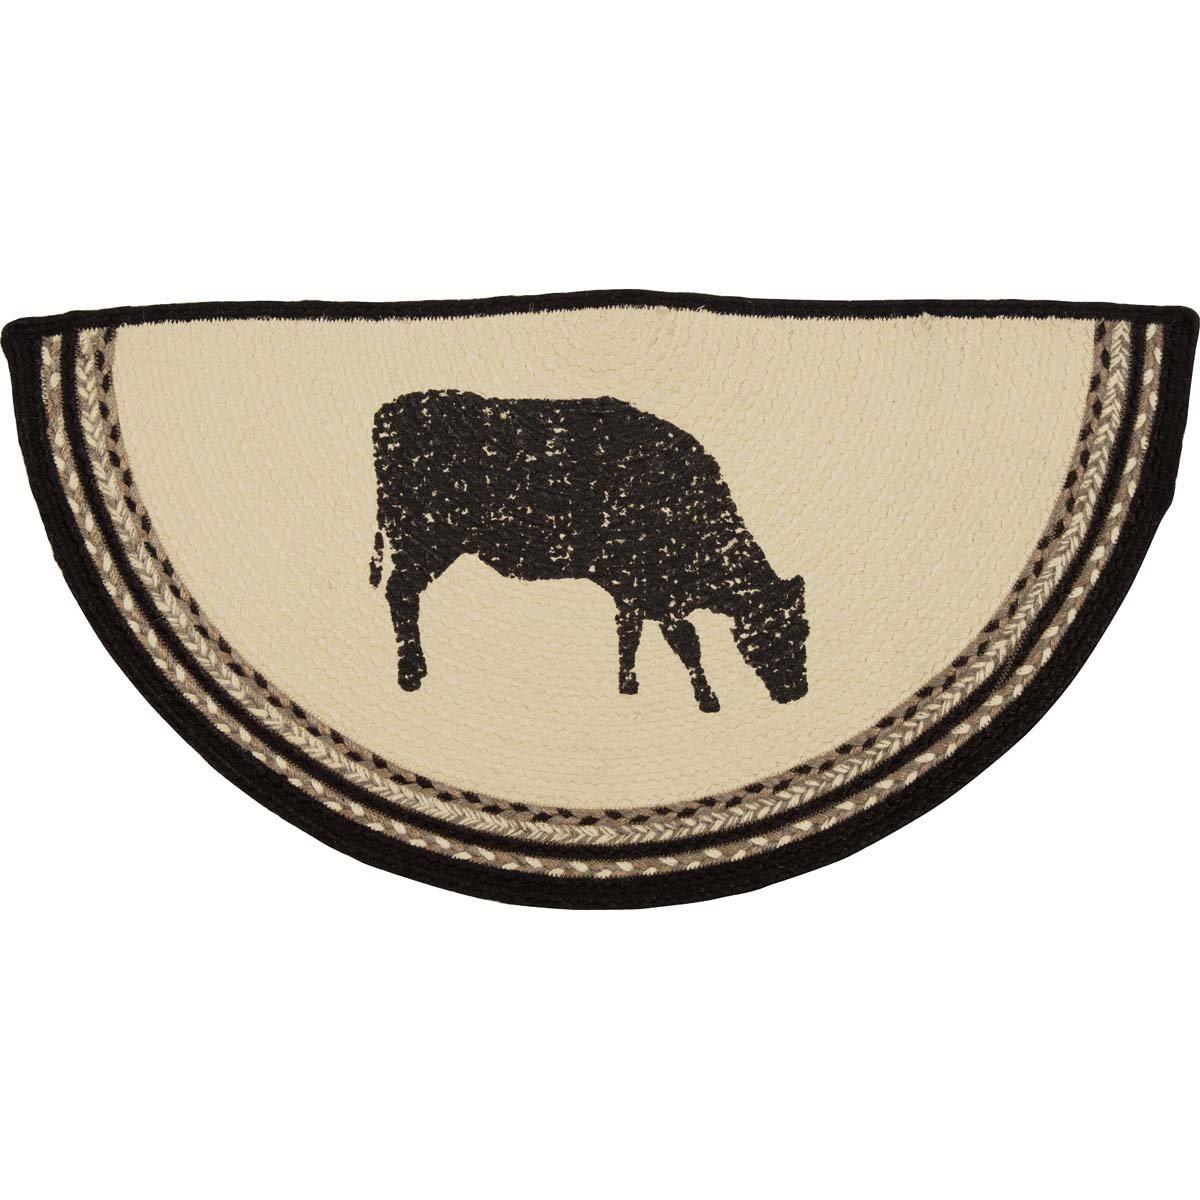 Sawyer Mill Cow Jute Rug Half Circle (16.5x33)